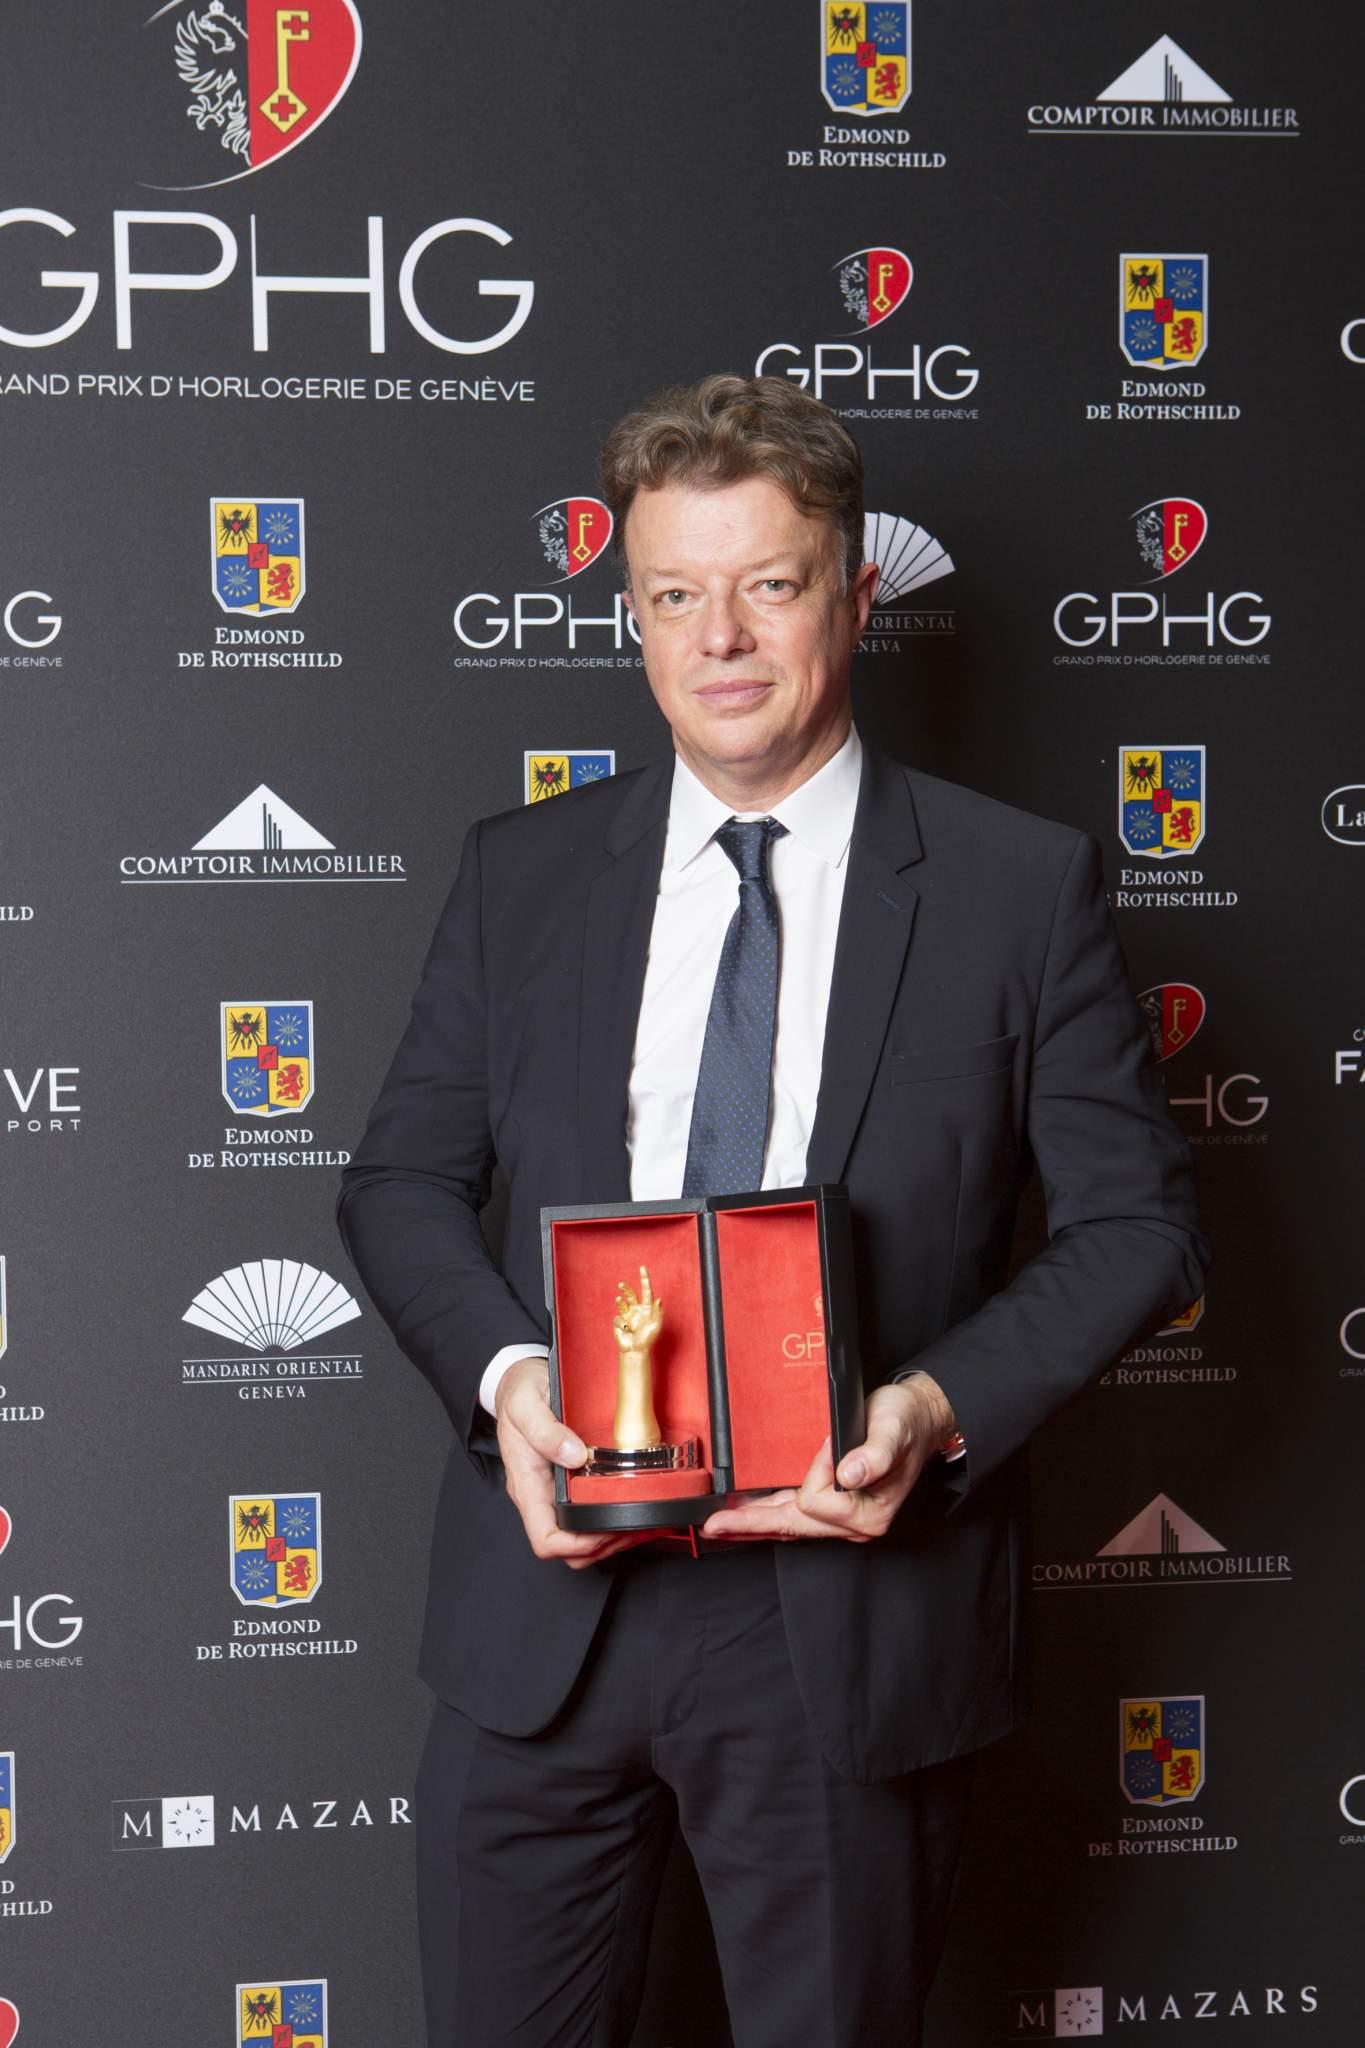 Nicolas Beau (International Watch Director of Chanel, winner of the Jewellery Watch Prize 2016)